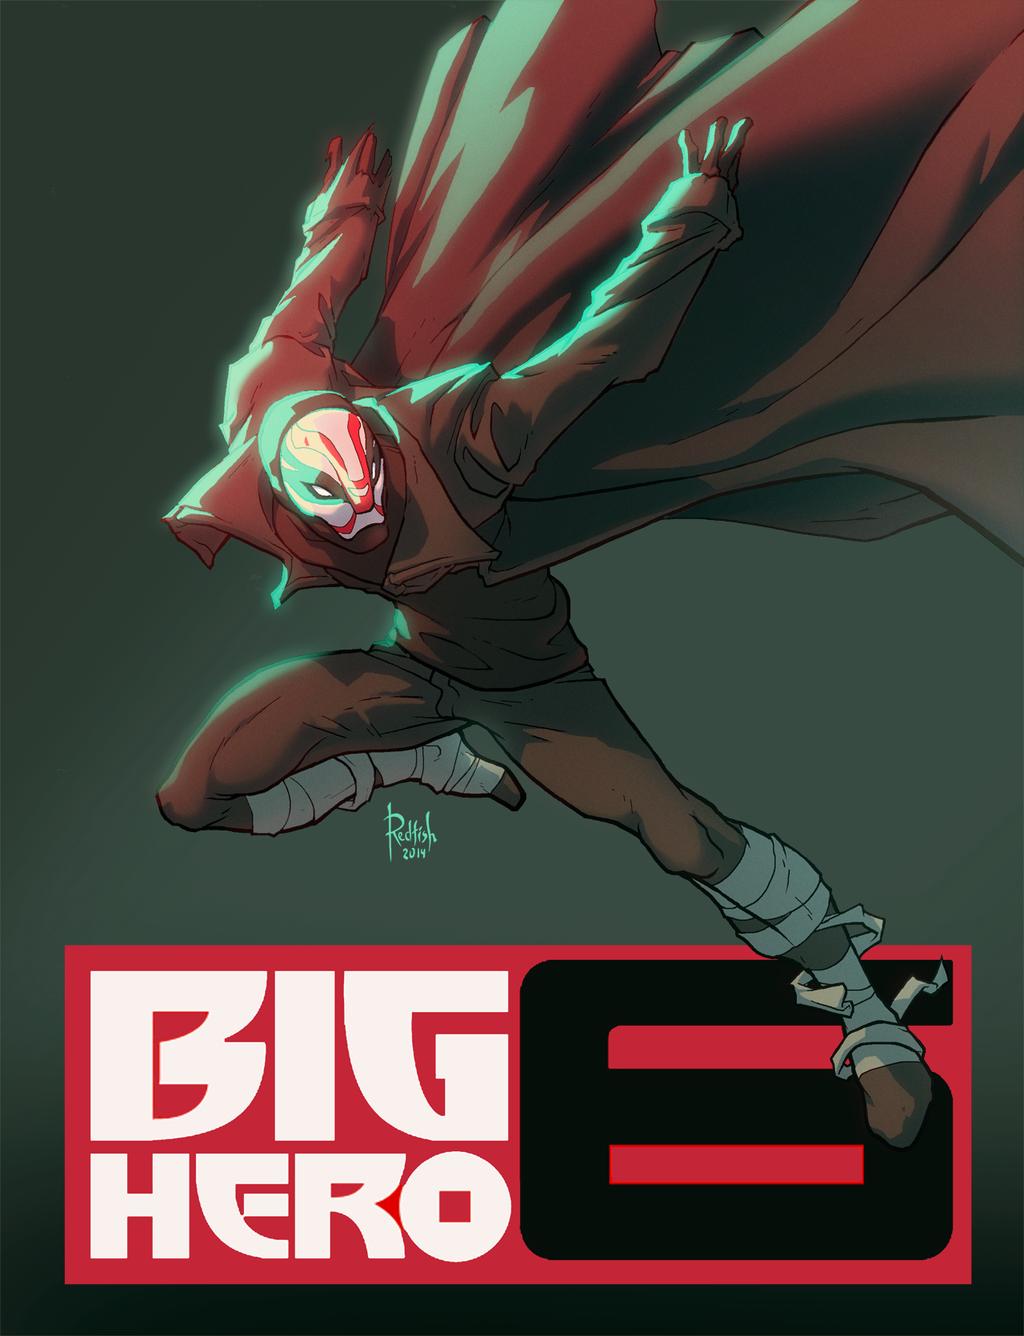 Big Hero 6 Coloring Page - Big Hero 6 Photo (37733029) - Fanpop ... | 1336x1024